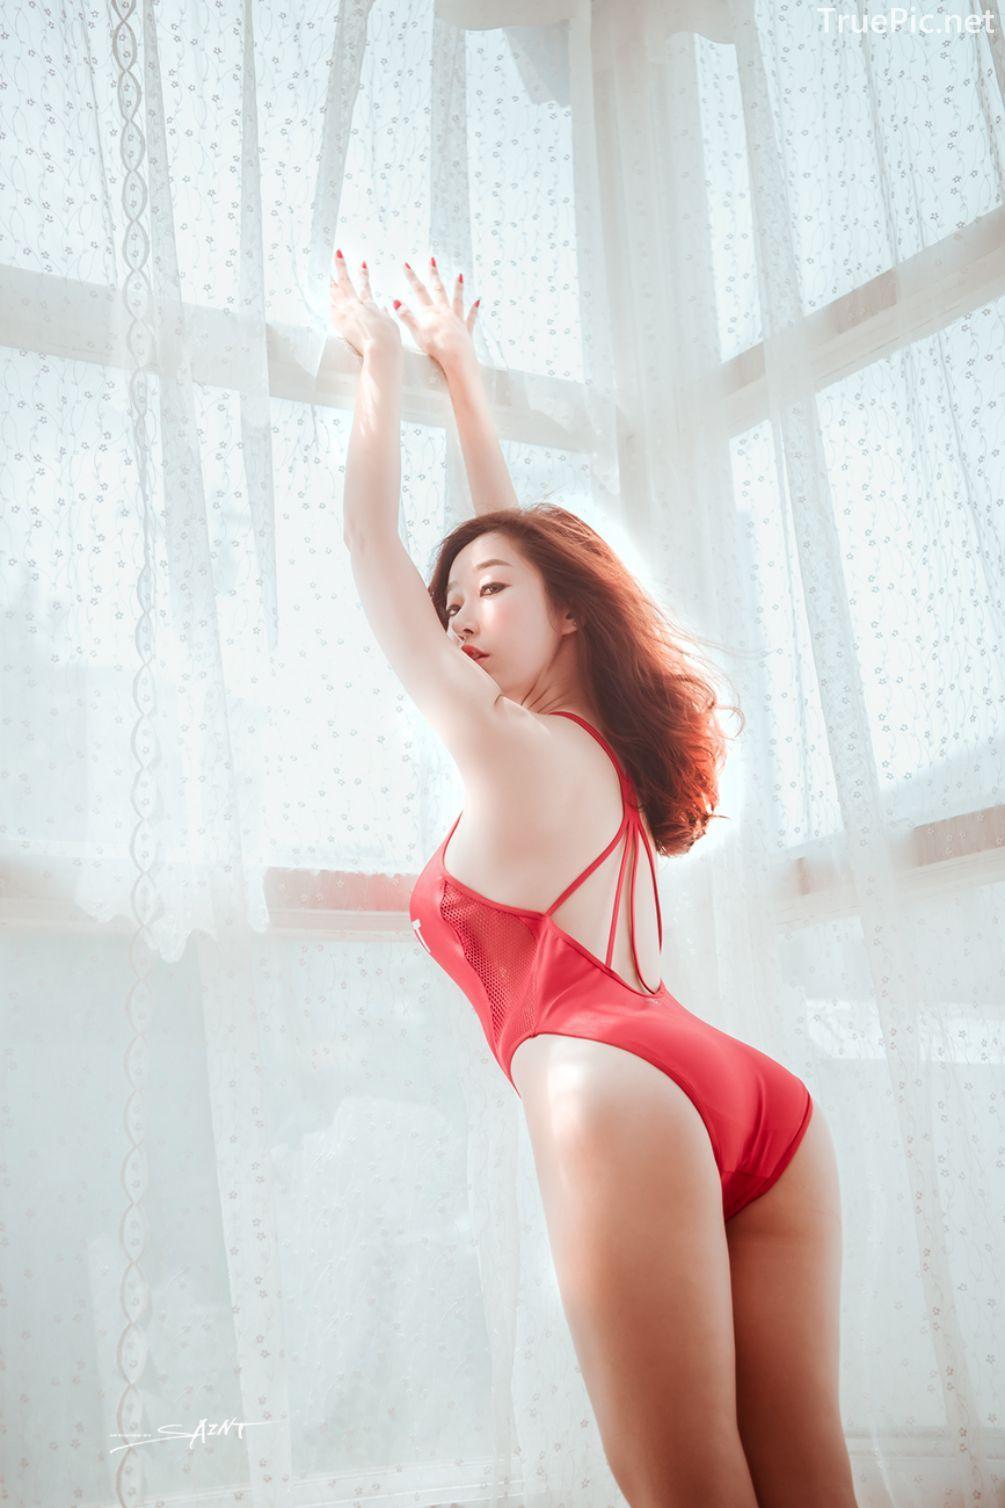 Korean-model-Oh-Haru-Sexy-Indoor-Photoshoot-Collection-TruePic.net- Picture-7